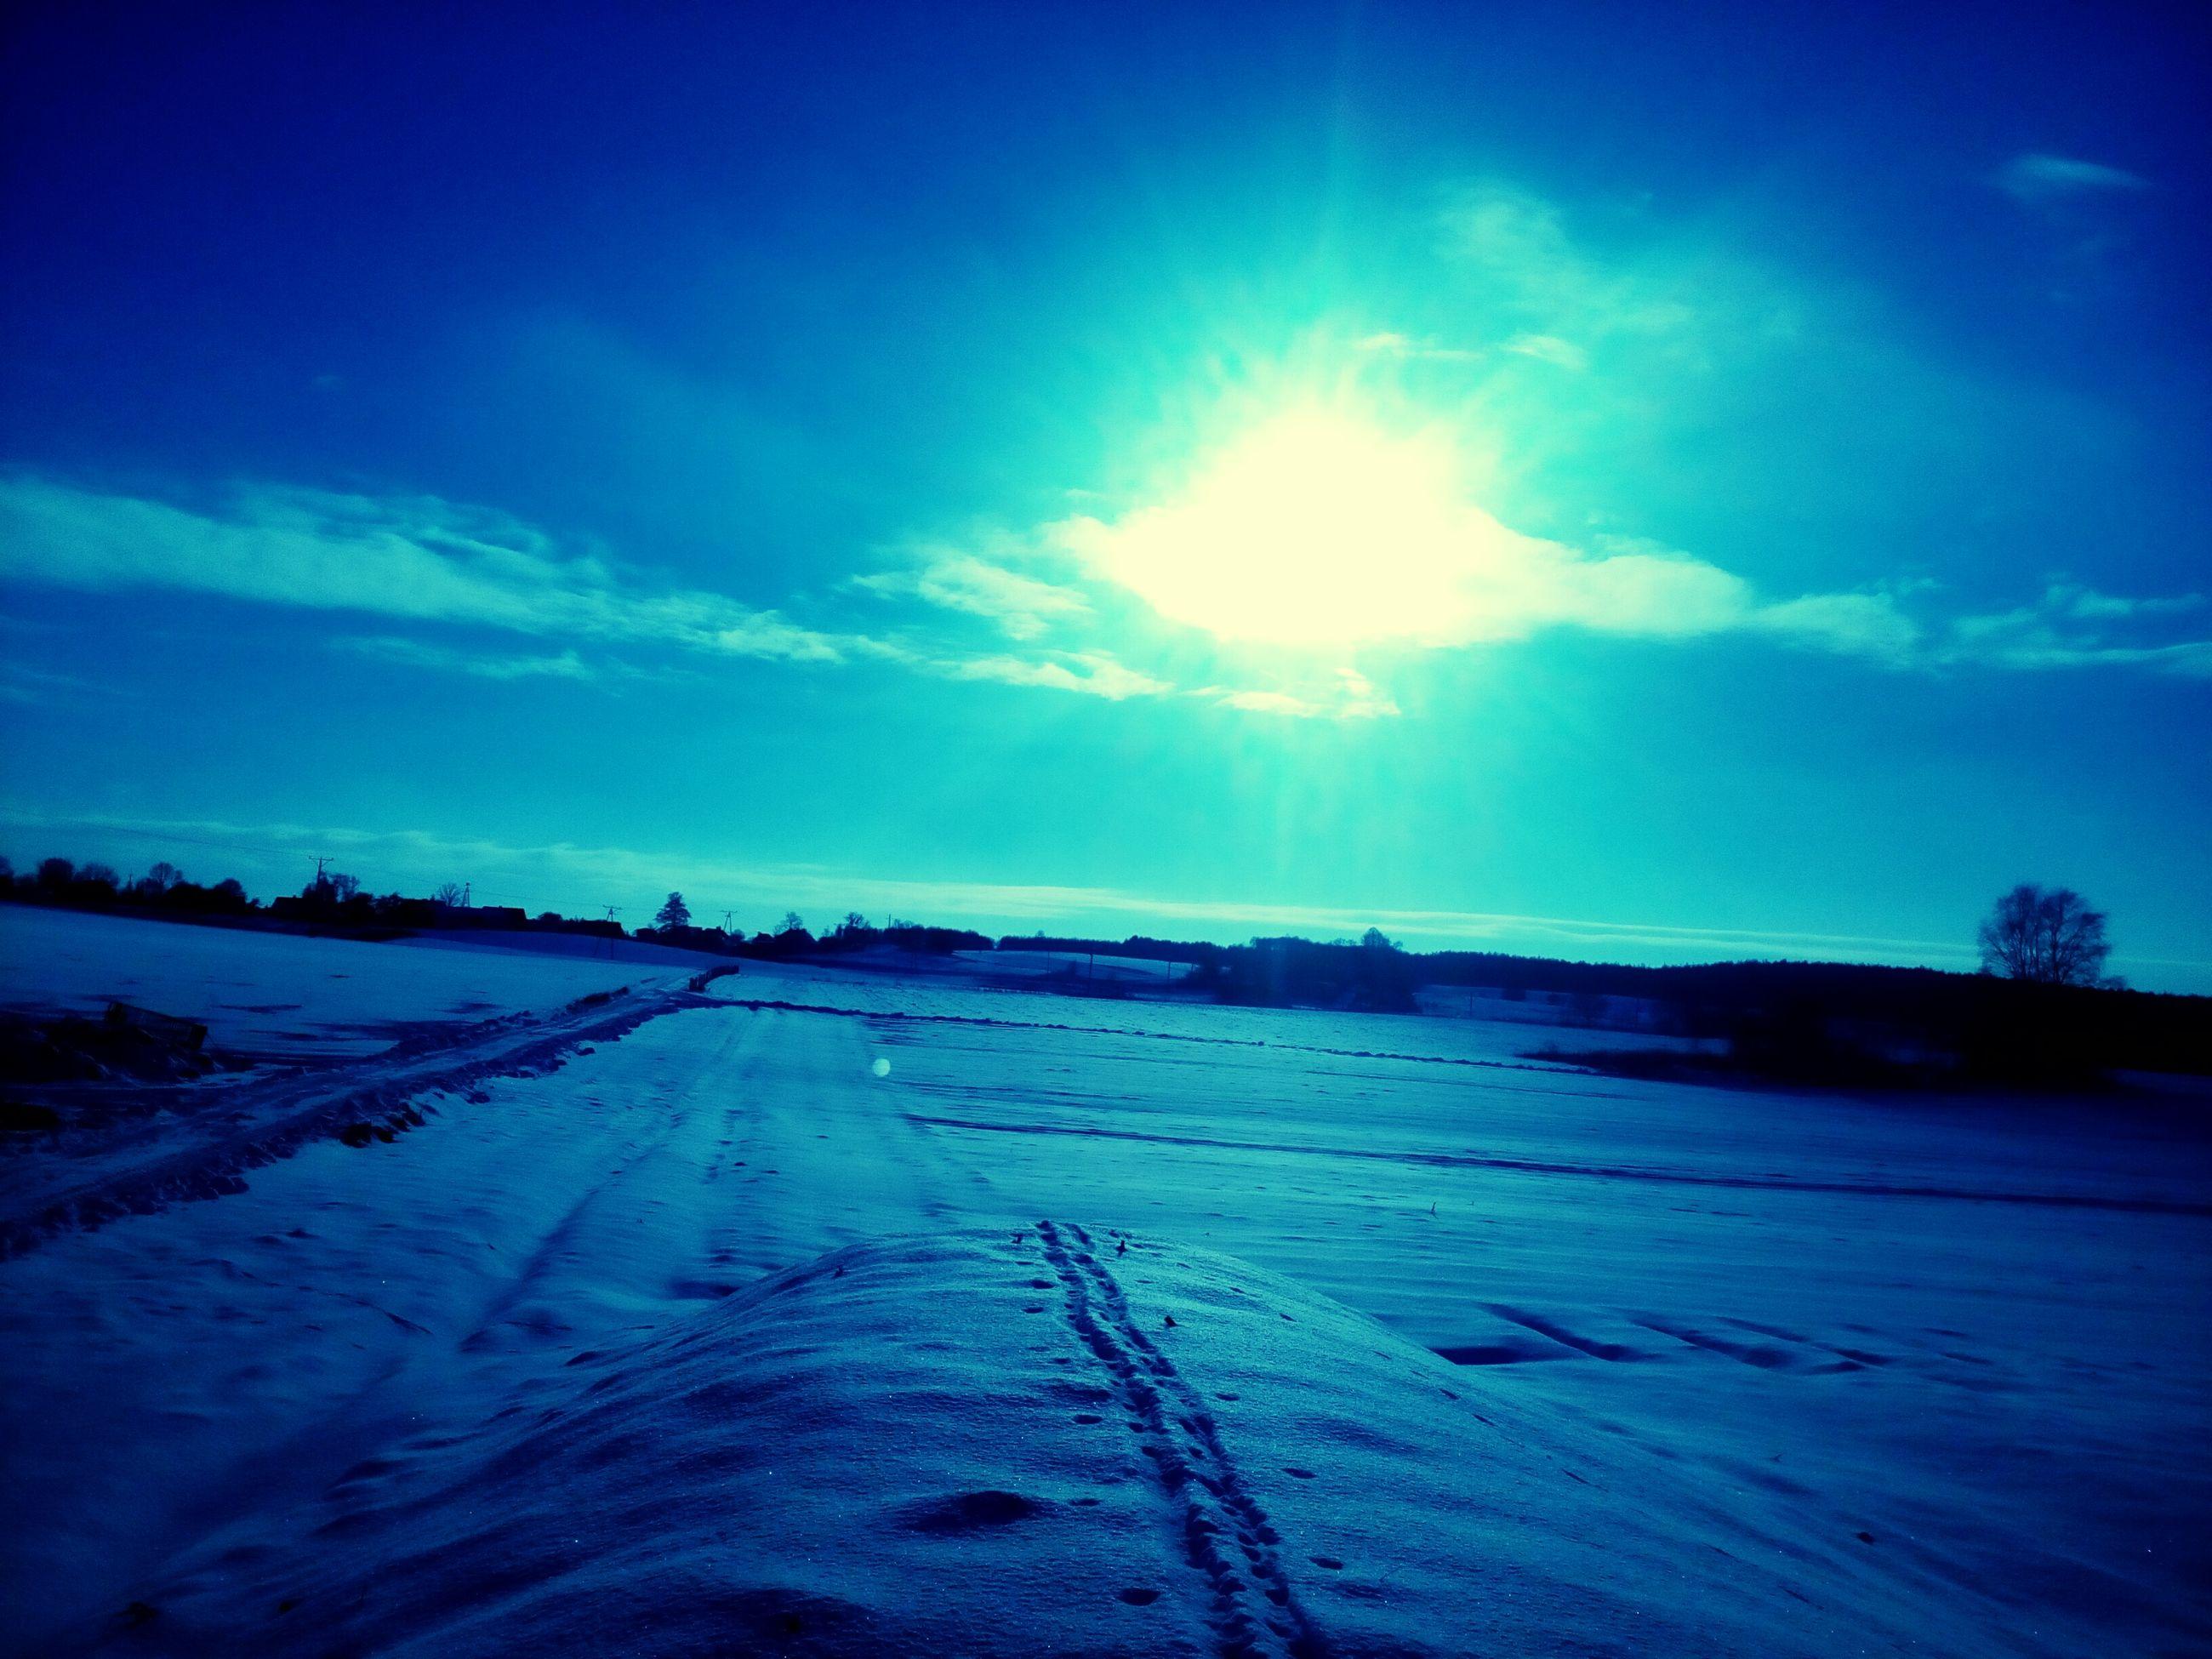 snow, winter, cold temperature, sky, landscape, tranquility, tranquil scene, season, blue, nature, field, sun, beauty in nature, sunlight, weather, scenics, covering, frozen, cloud - sky, sunbeam